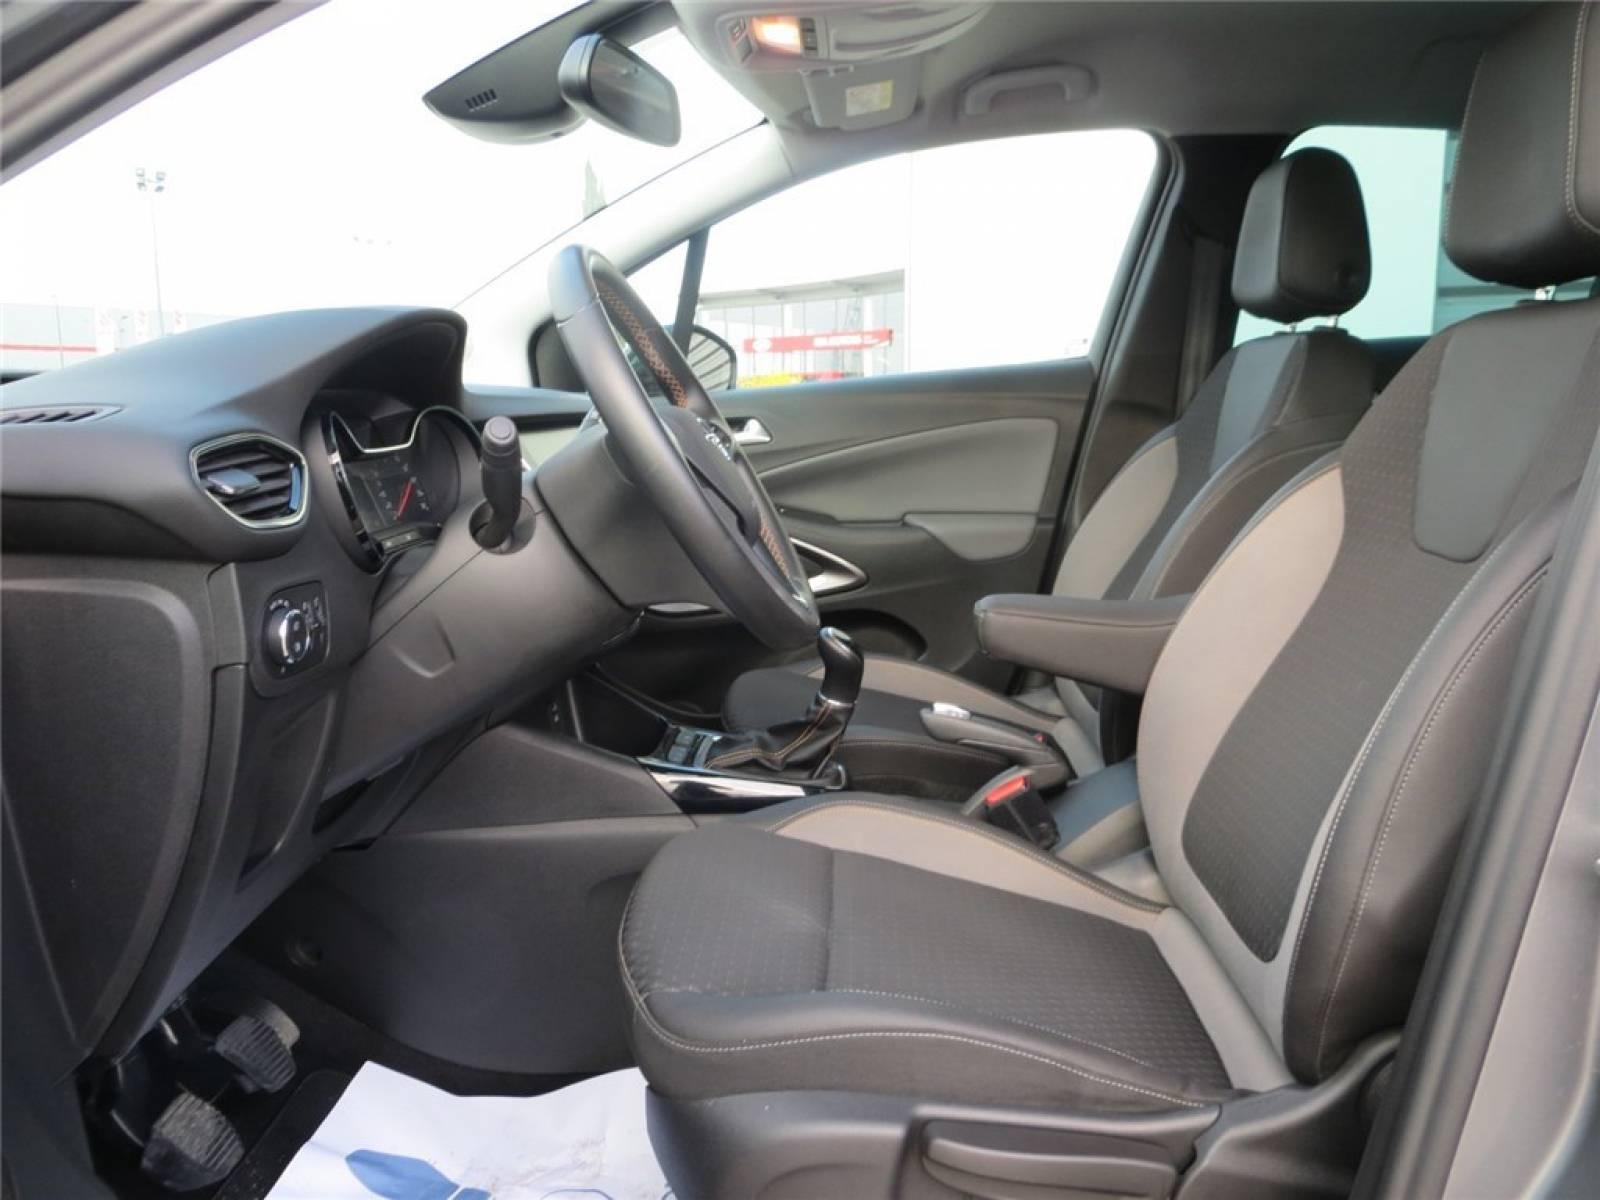 OPEL Crossland X 1.2 Turbo 110 ch ECOTEC - véhicule d'occasion - Groupe Guillet - Opel Magicauto - Chalon-sur-Saône - 71380 - Saint-Marcel - 5